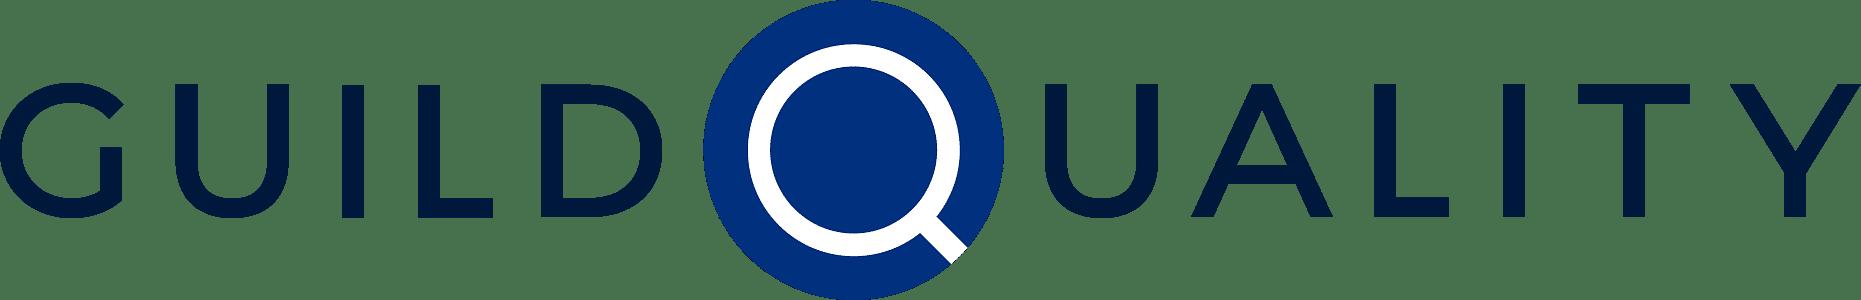 Guild Quality Logo Transparent Png Stickpng